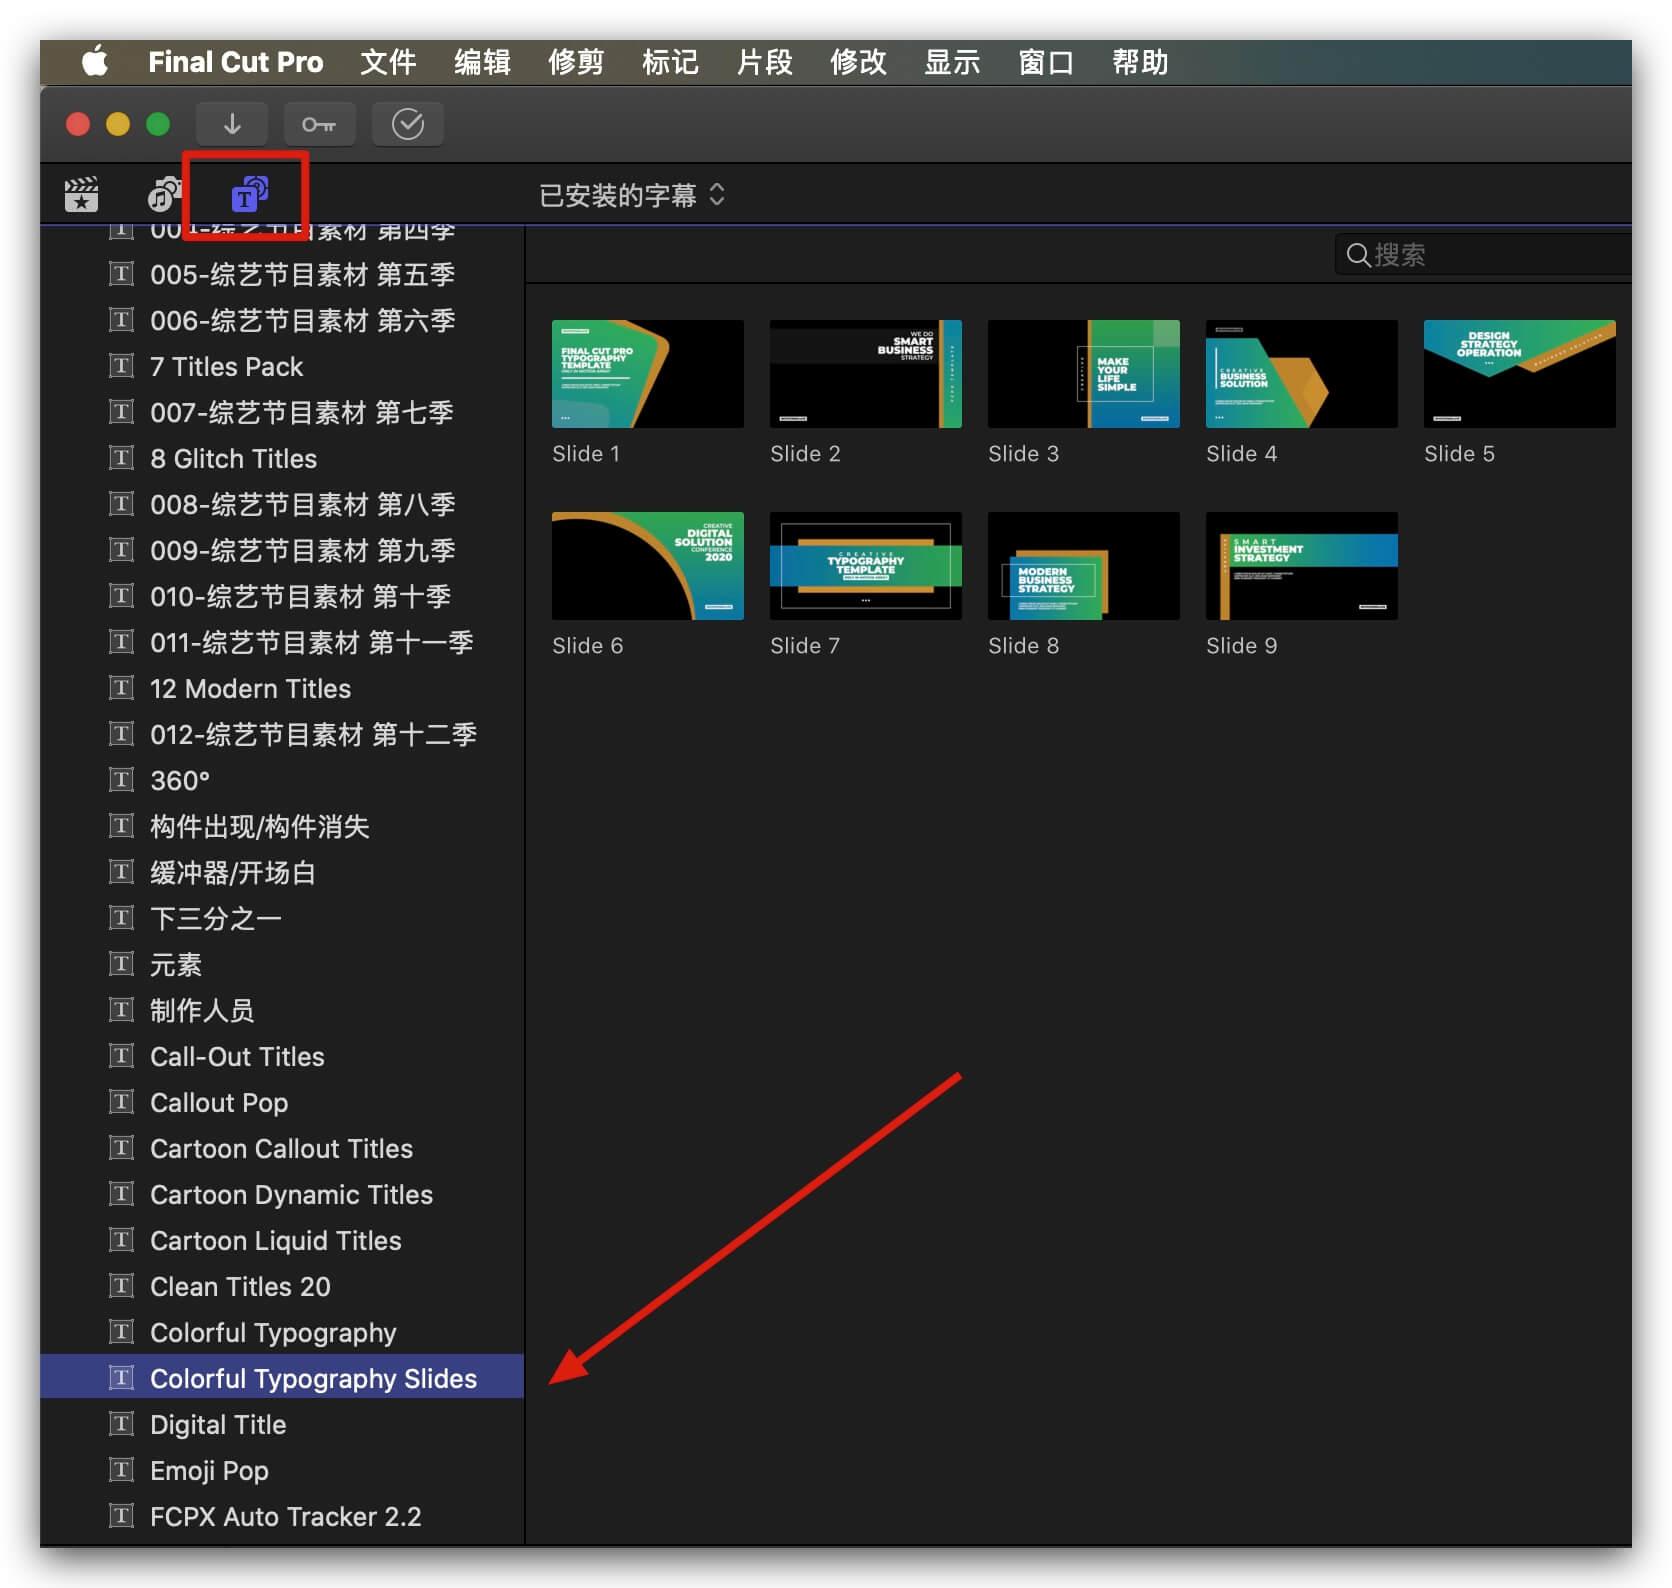 fcpx插件 简约彩色侧边栏图文版式动画模板 Colorful Typography Slides